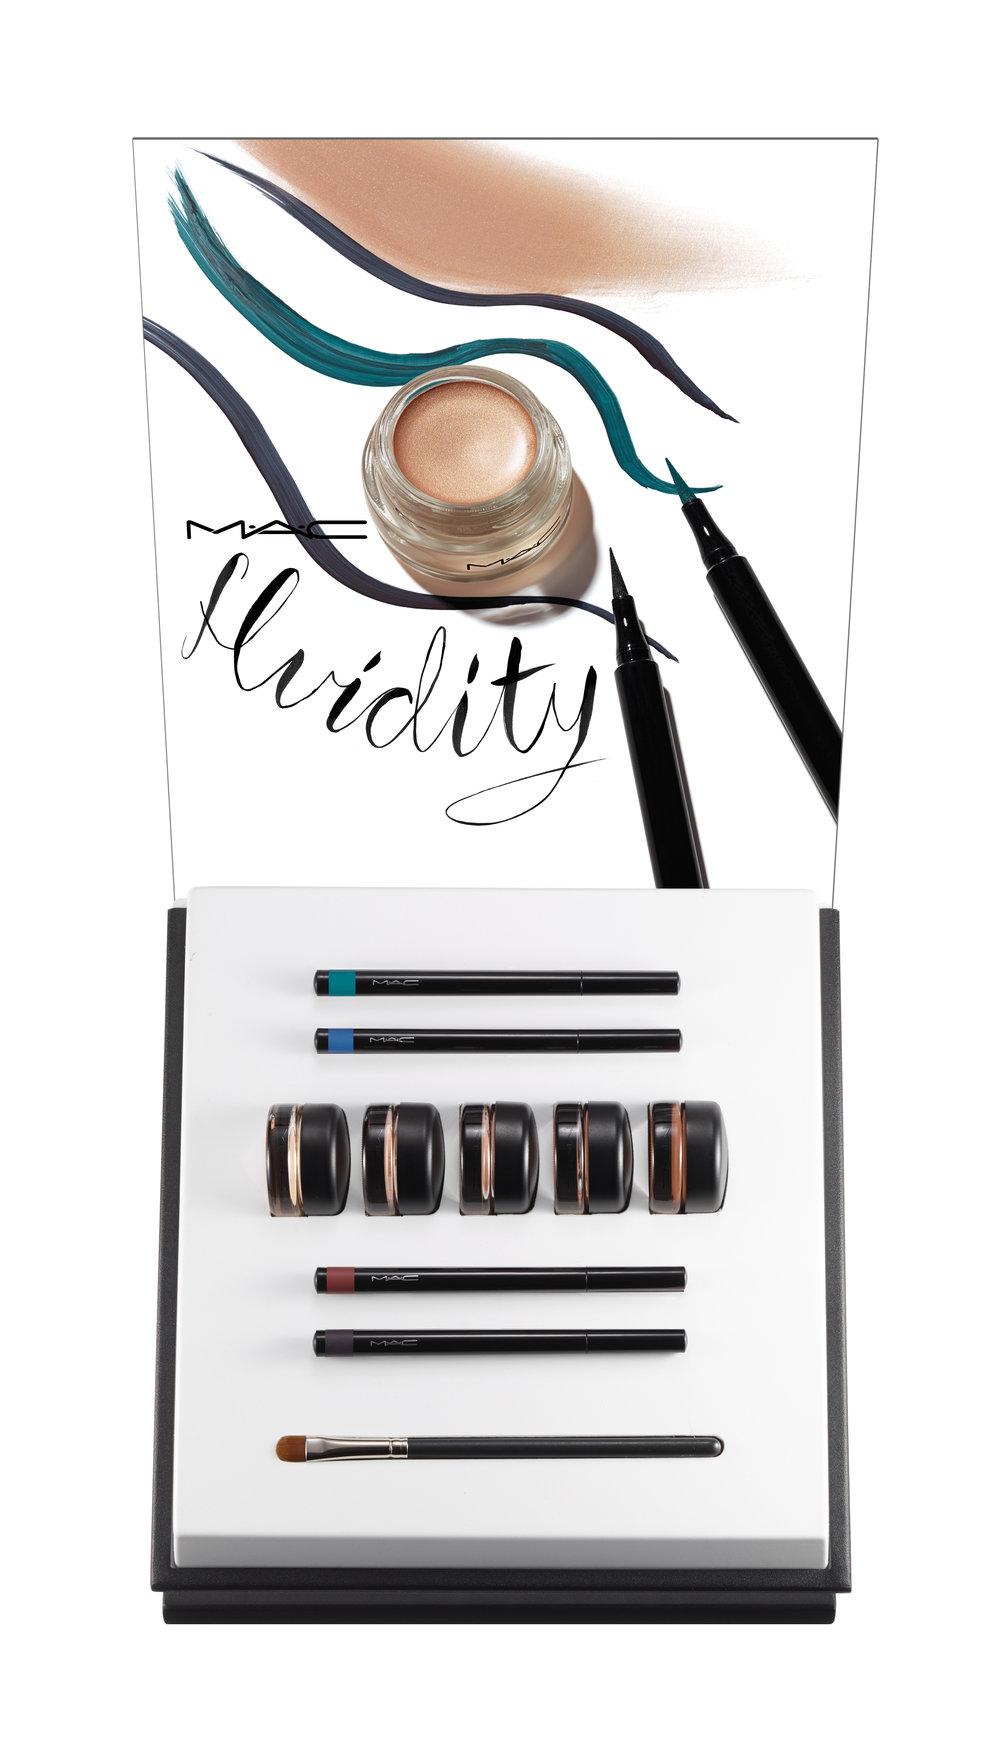 the_wieland_initiative_mac_cosmetics_launch_fluidity.jpg